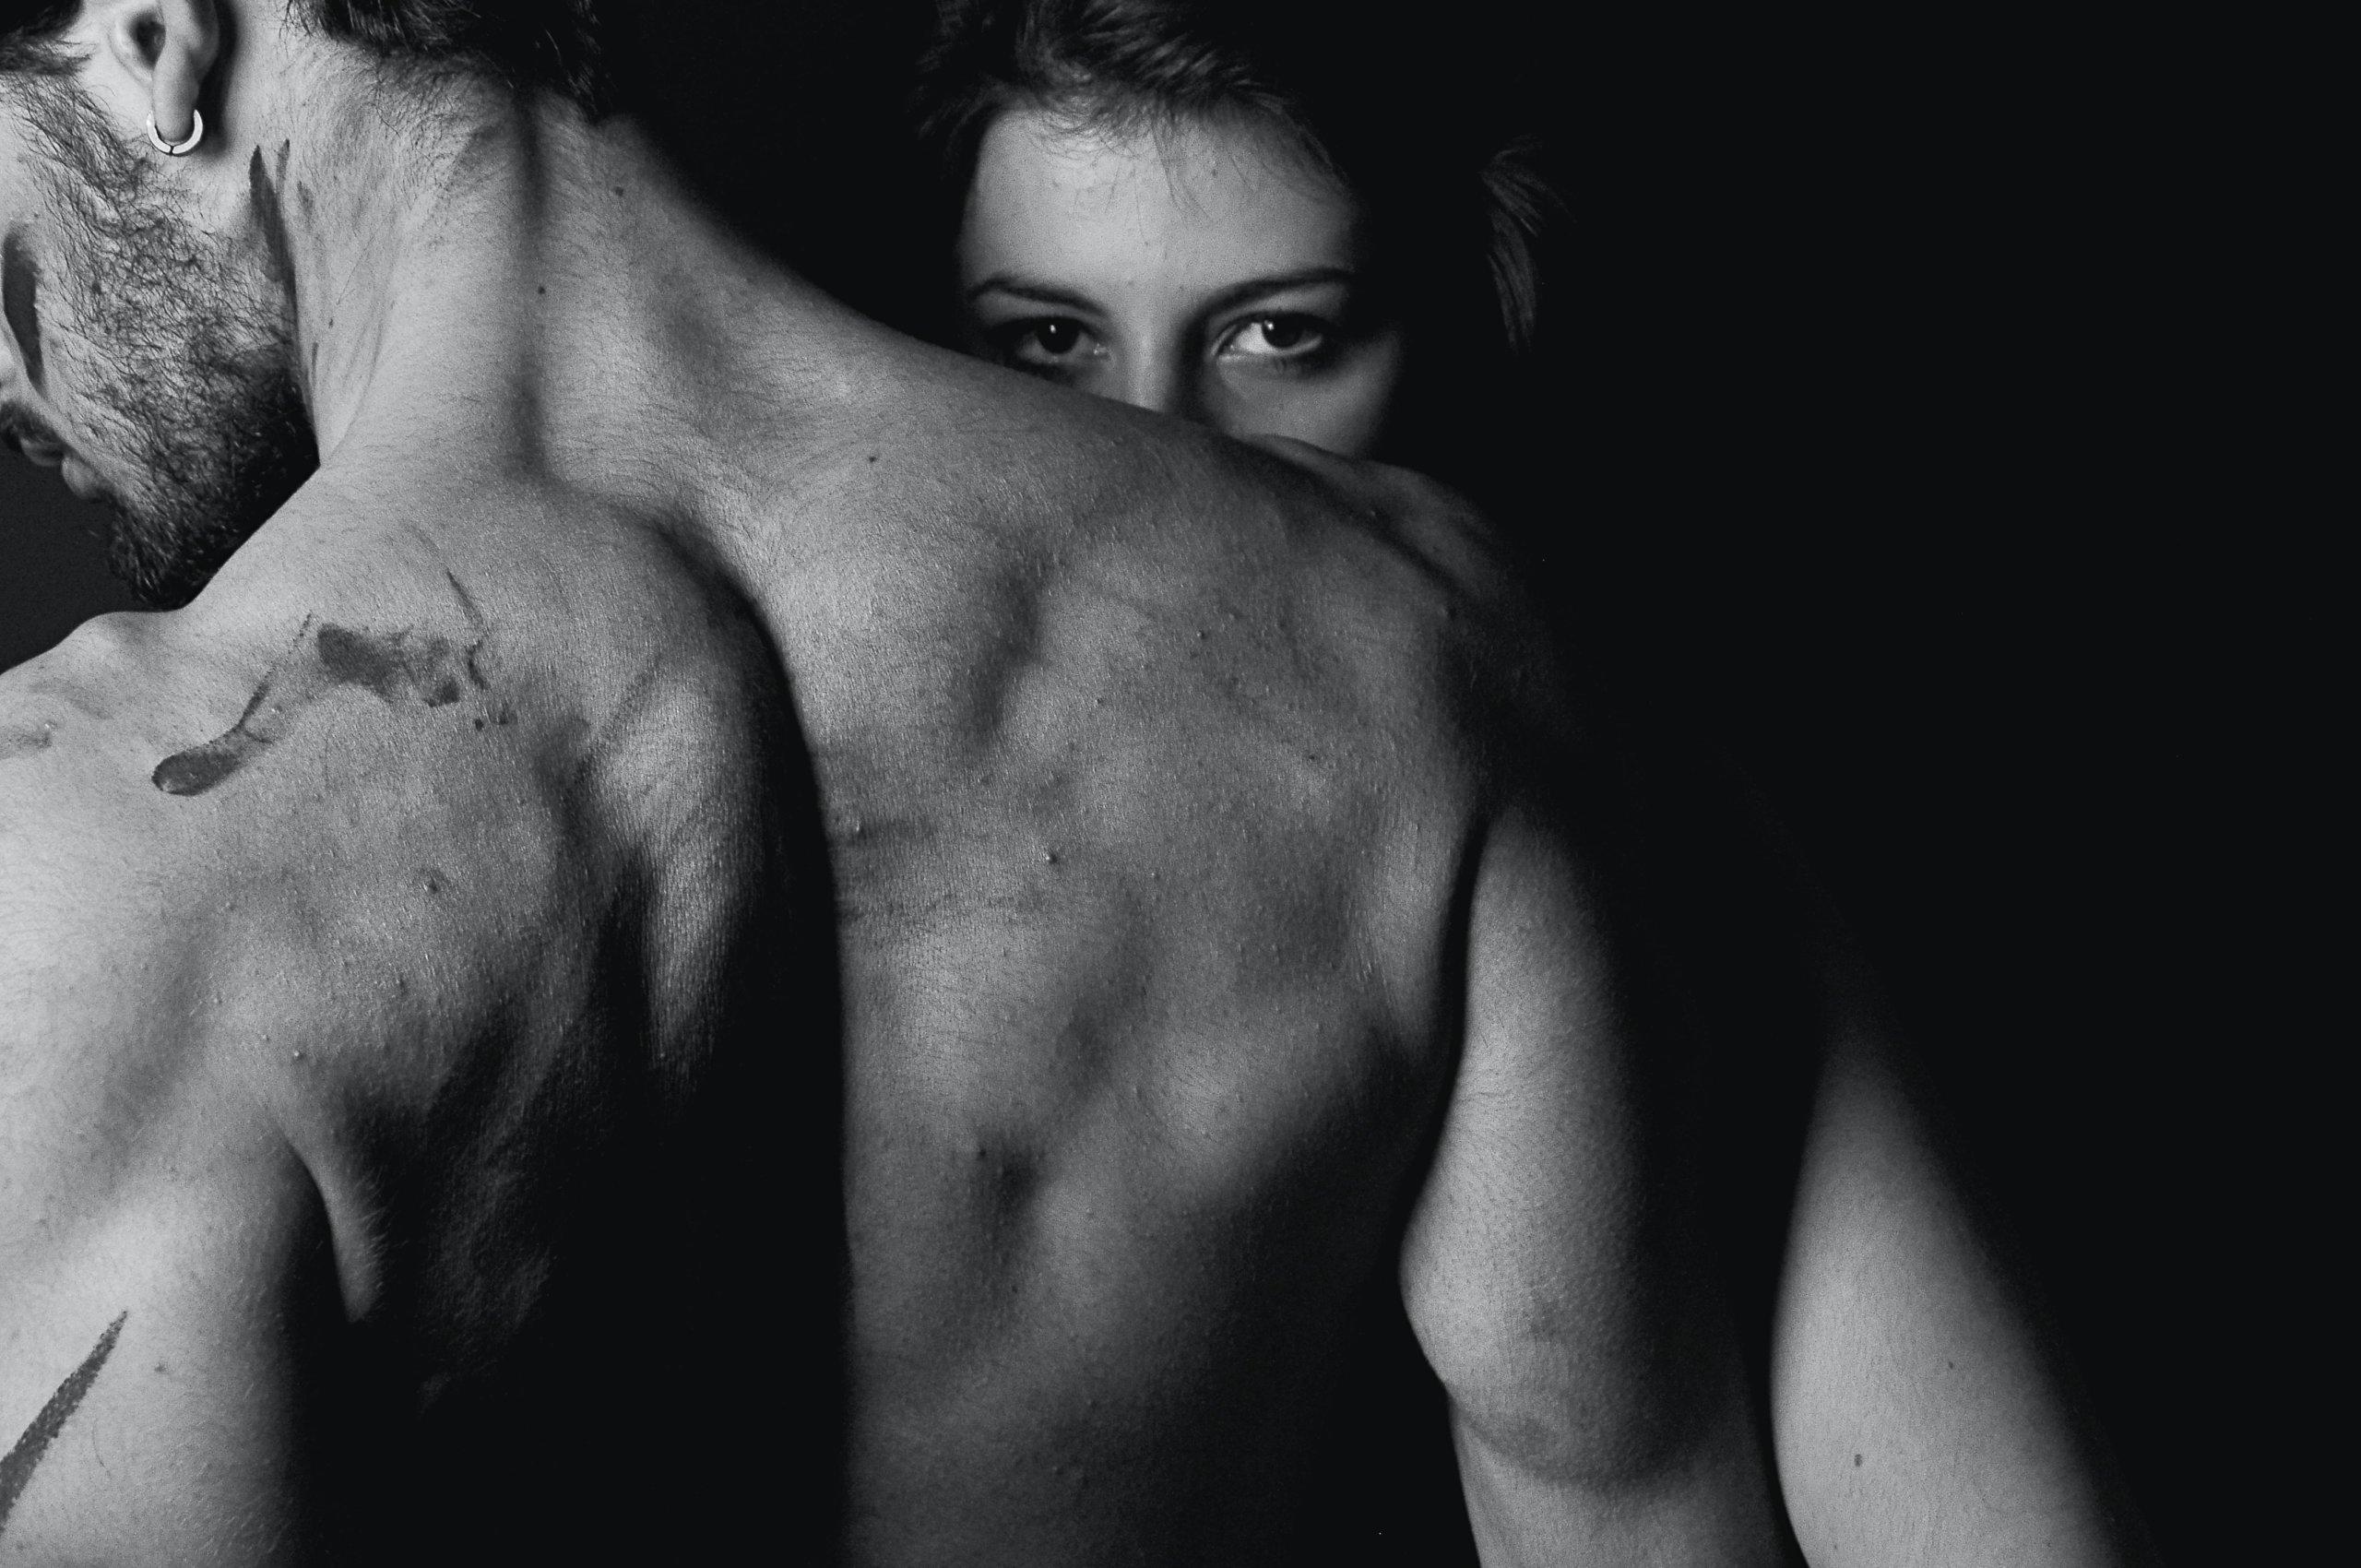 Man's back view - boost male libido